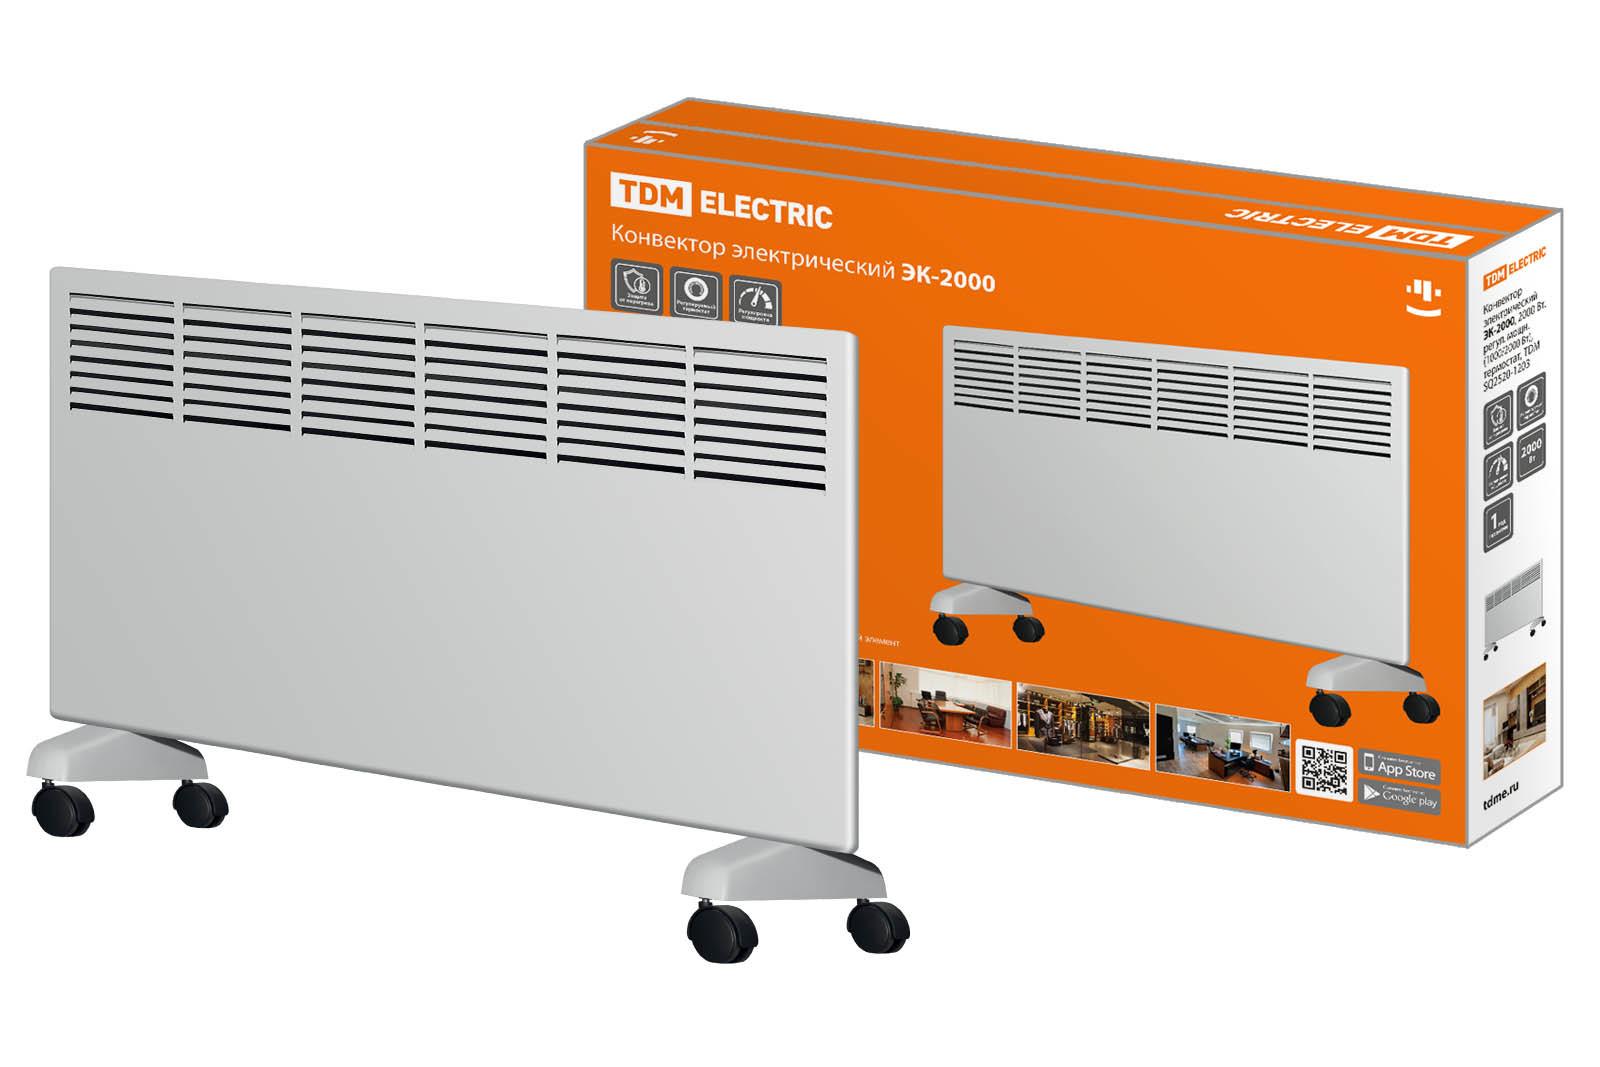 Конвектор электрический ЭК-2000, 2000 Вт, регул. мощн. (1000/2000 Вт), термостат, TDM